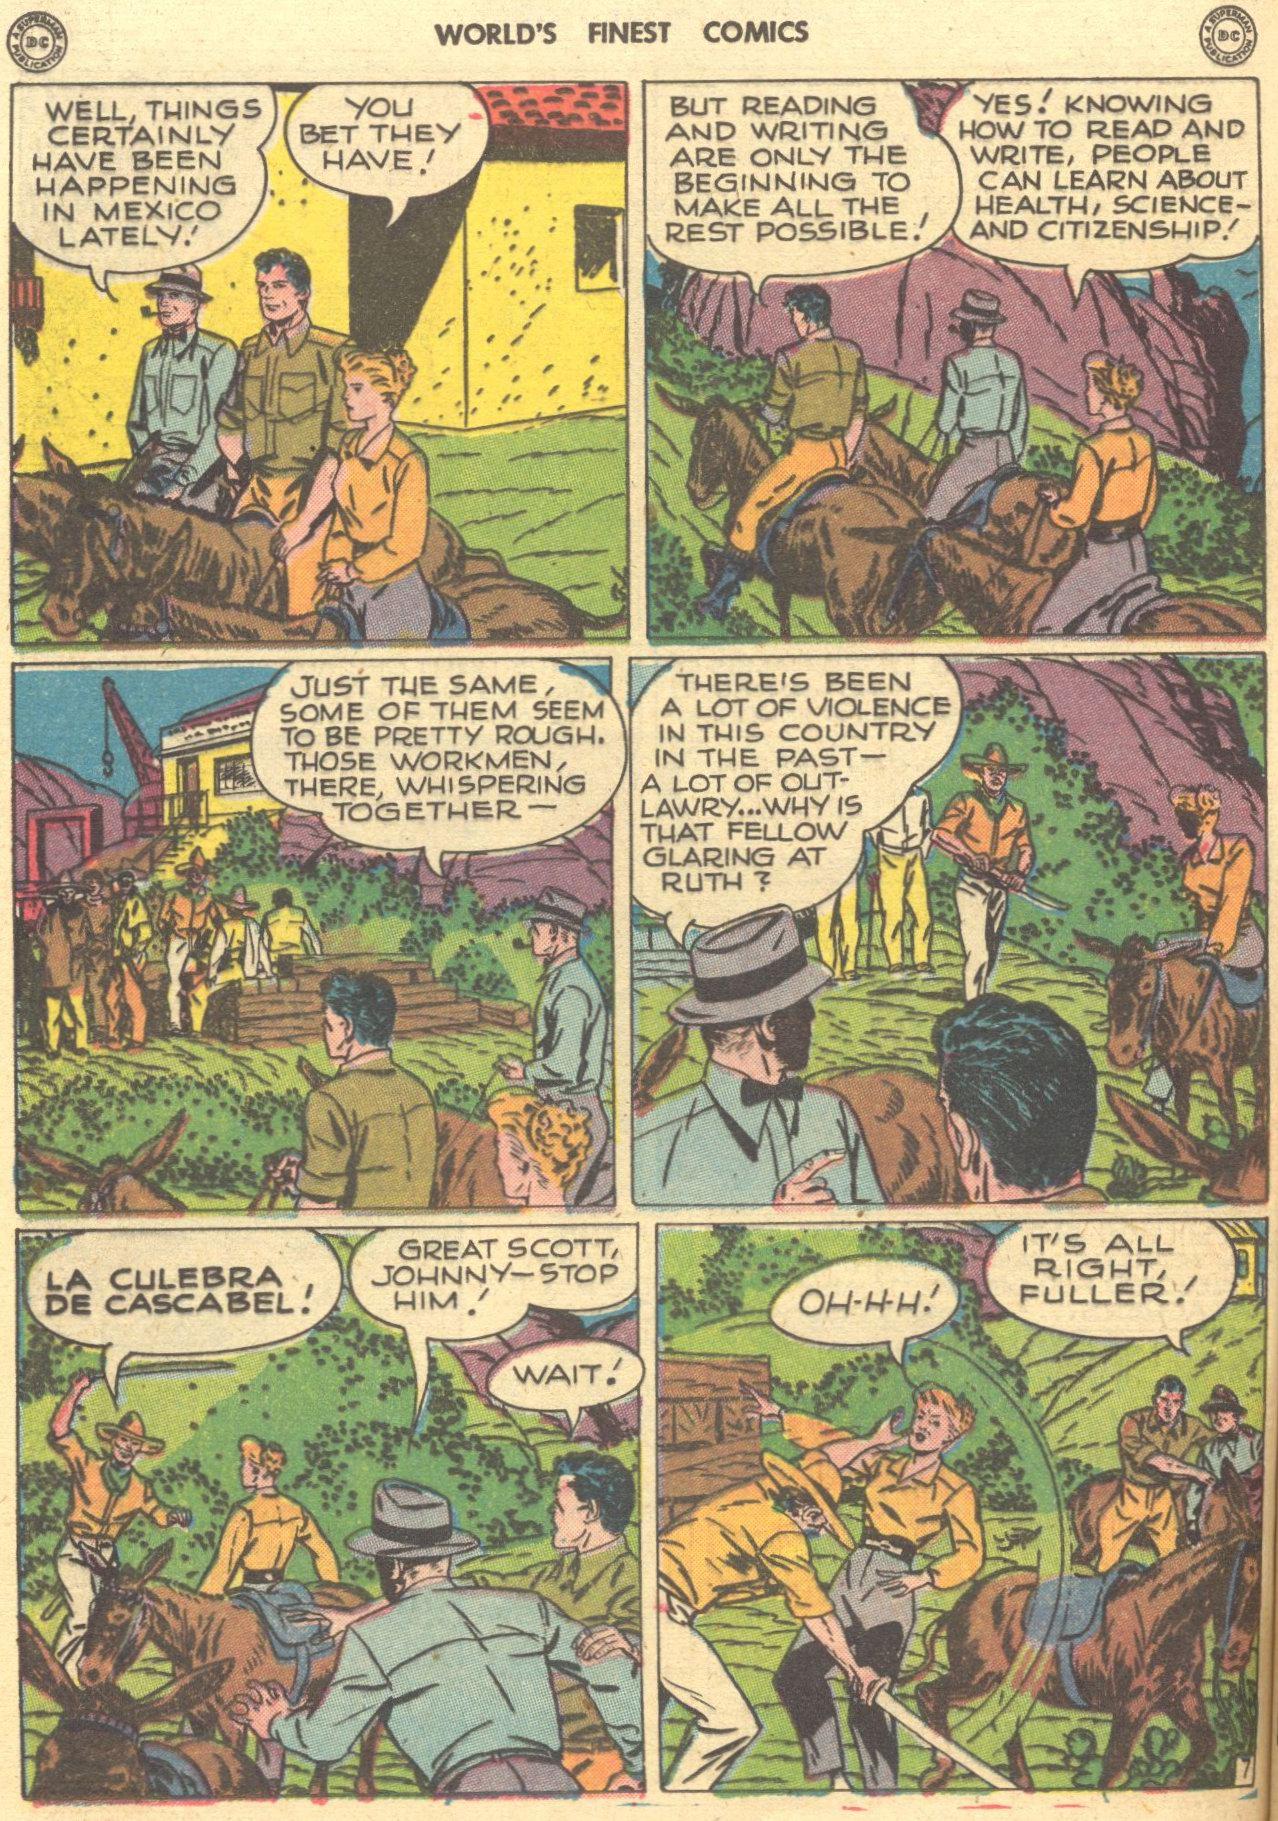 Read online World's Finest Comics comic -  Issue #28 - 57